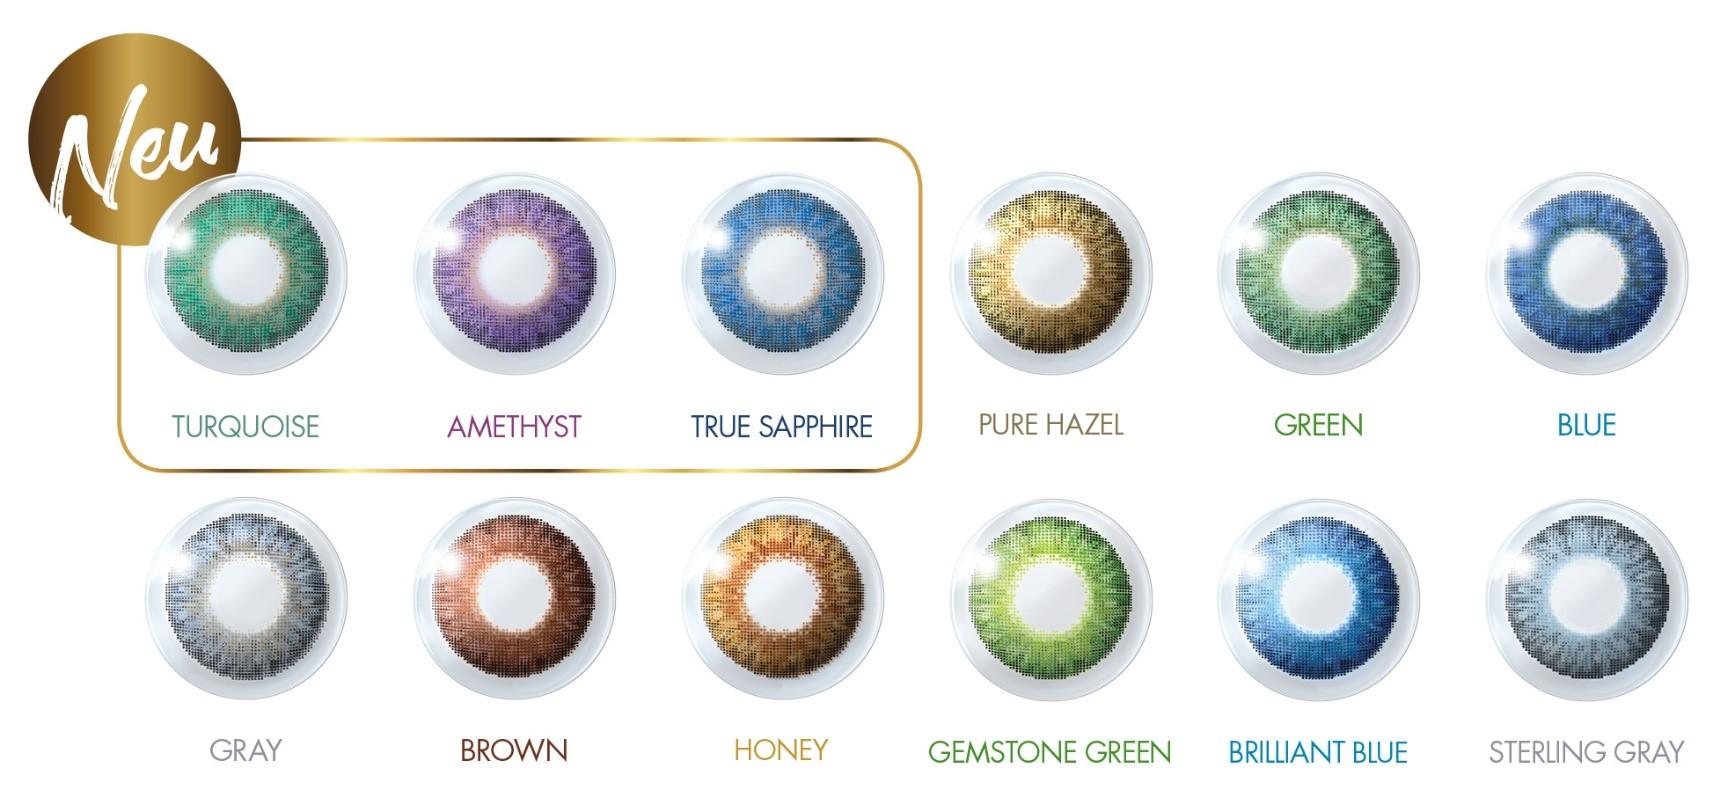 5b6f2b680c4 Contact Lenses - Air Optix Colors (FreshLook) - 2 color lenses - buy online  at lensvision.ch